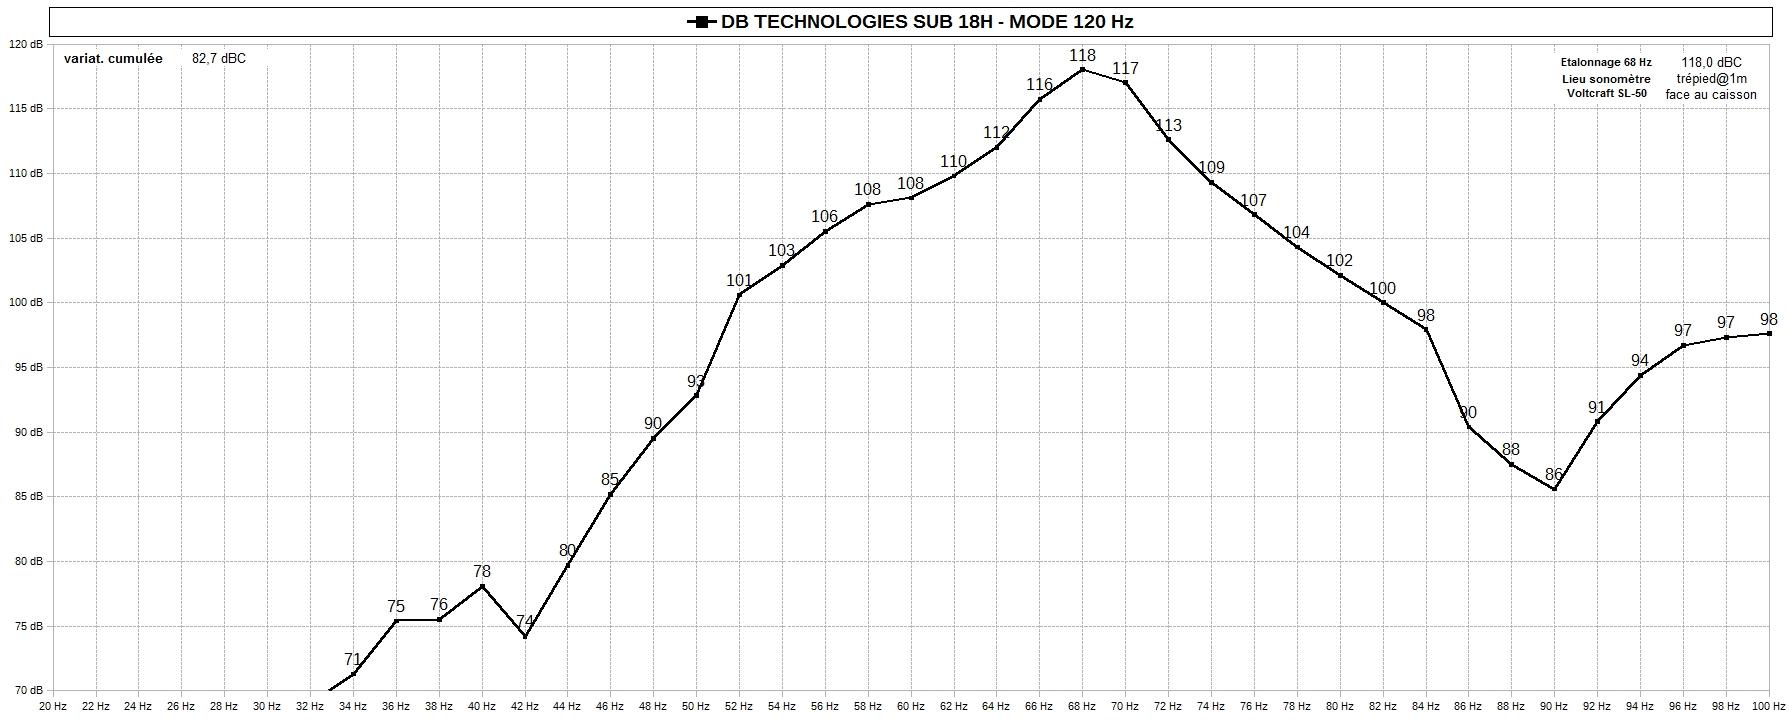 sub 18h - db technologies sub 18h